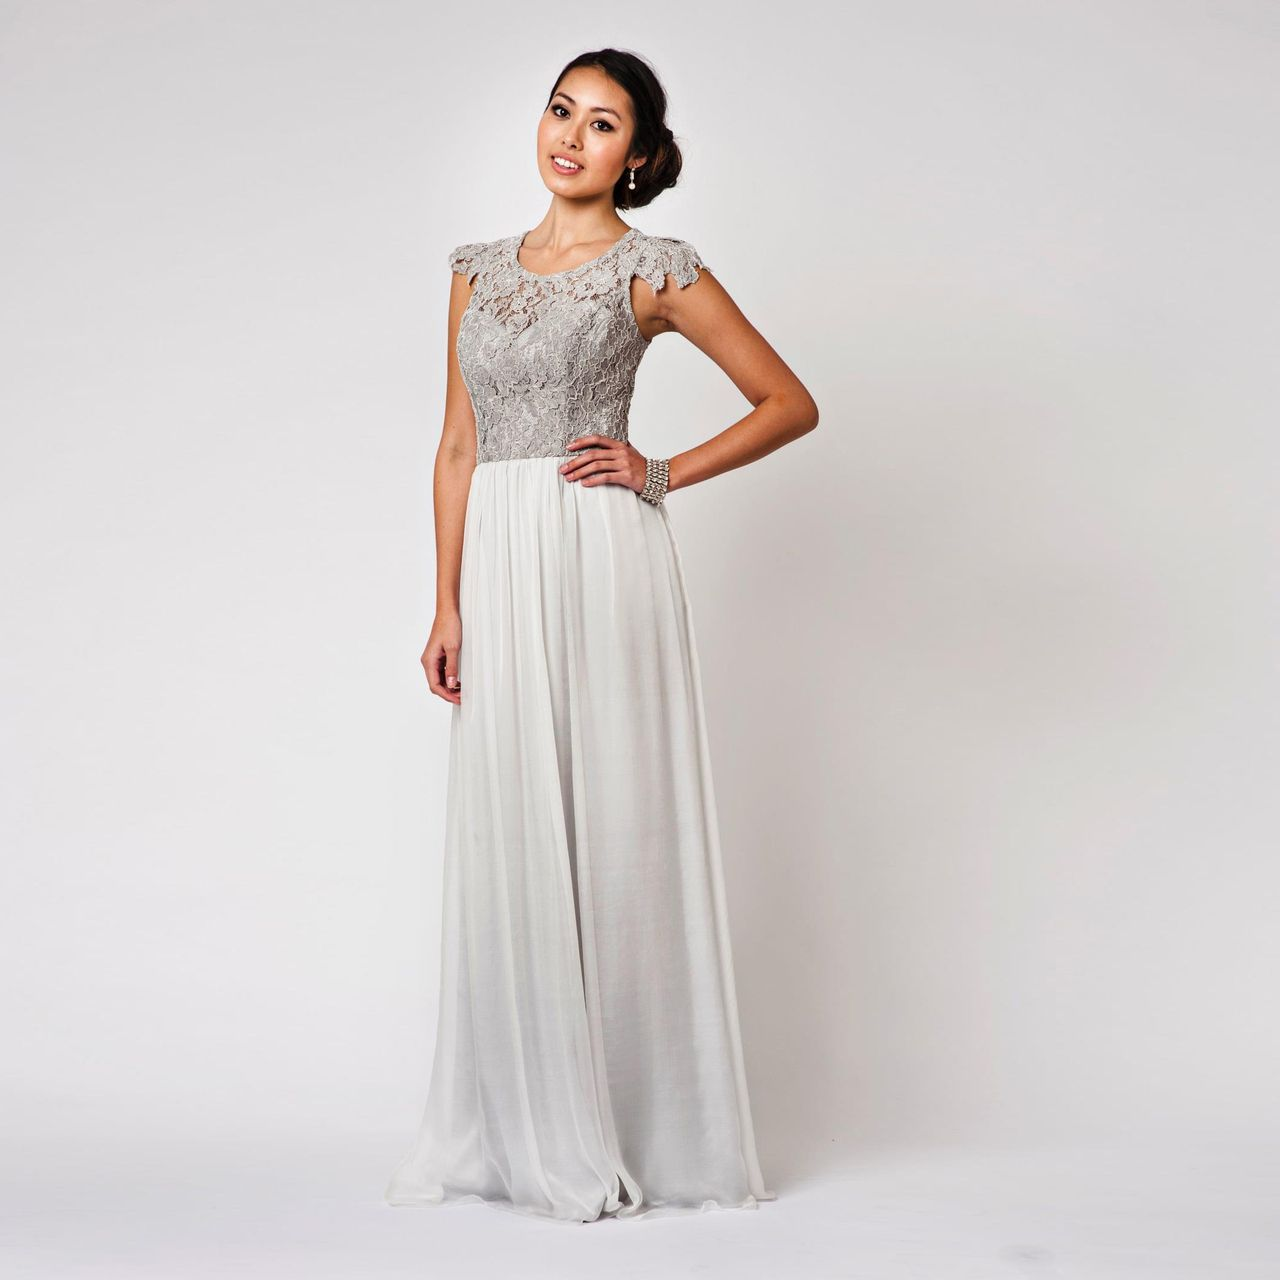 Tania olsen latitia silk dress grey in size 6 wedding long fashionably yours latitia grey laced silk bridesmaid dress 39900 http ombrellifo Images